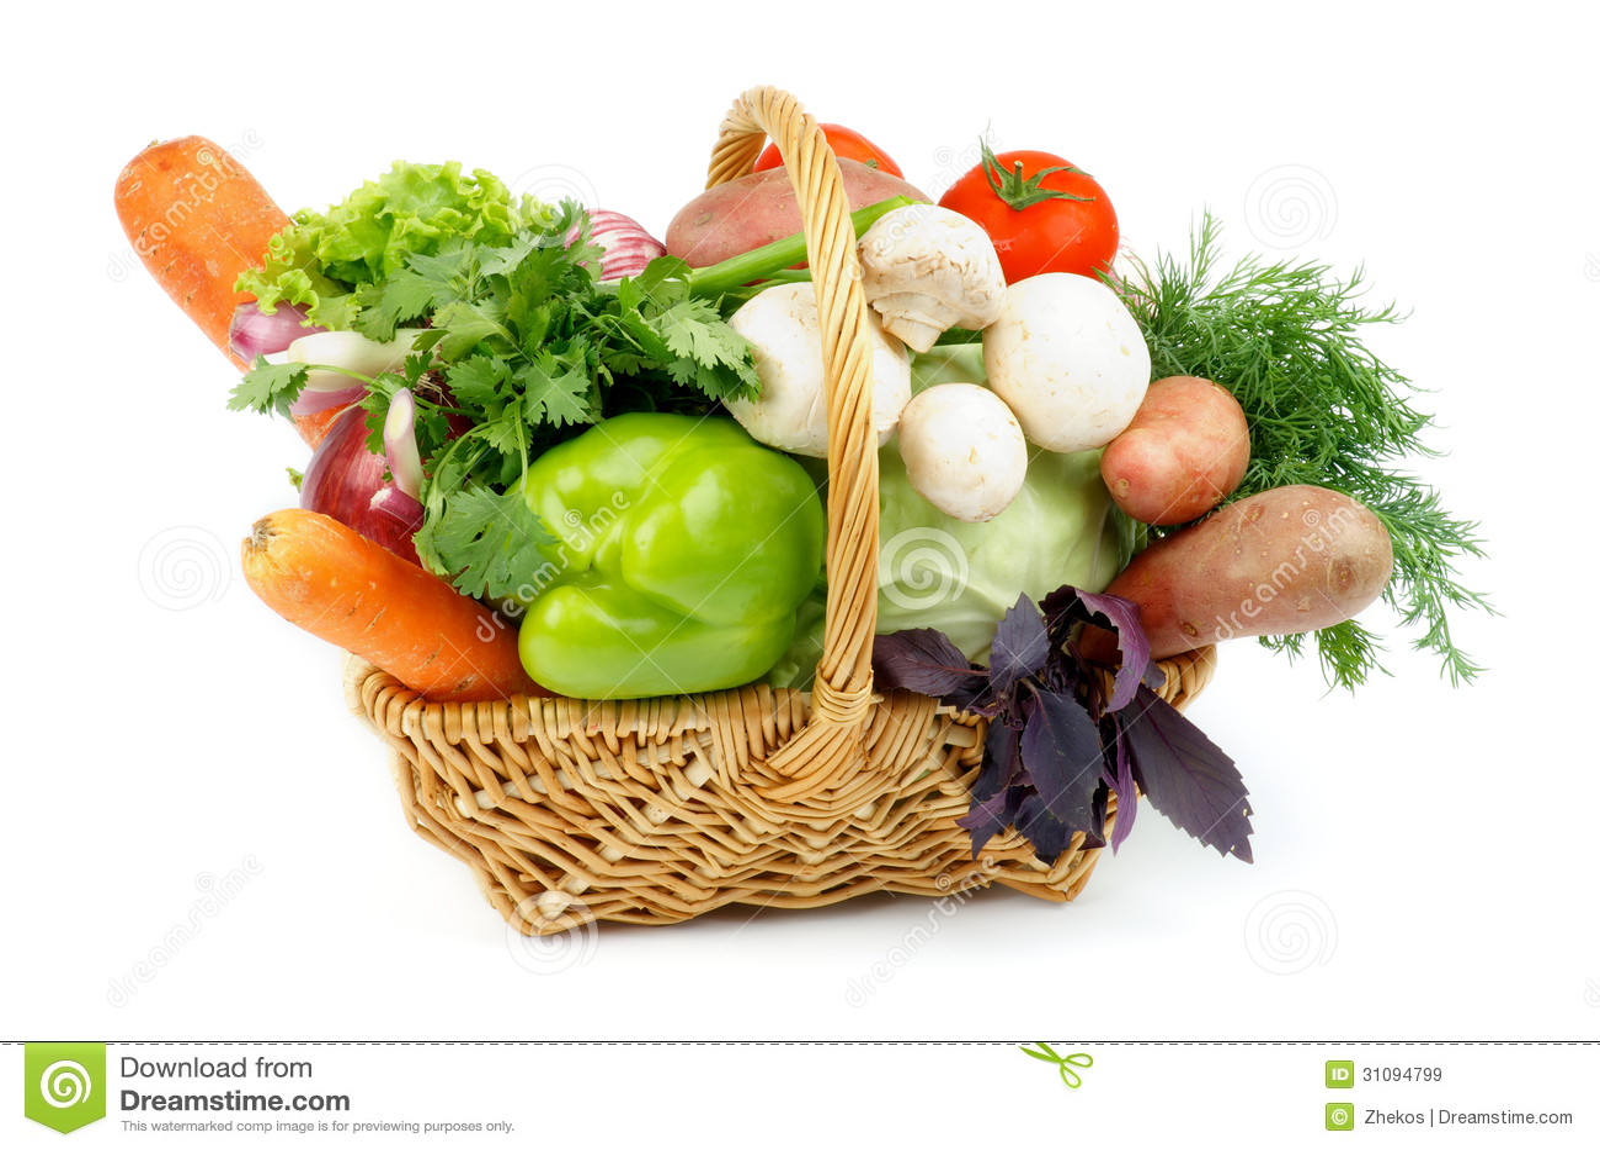 Basket of Various Vegetables with Green Bell Pepper, Carrots, Lettuce ...